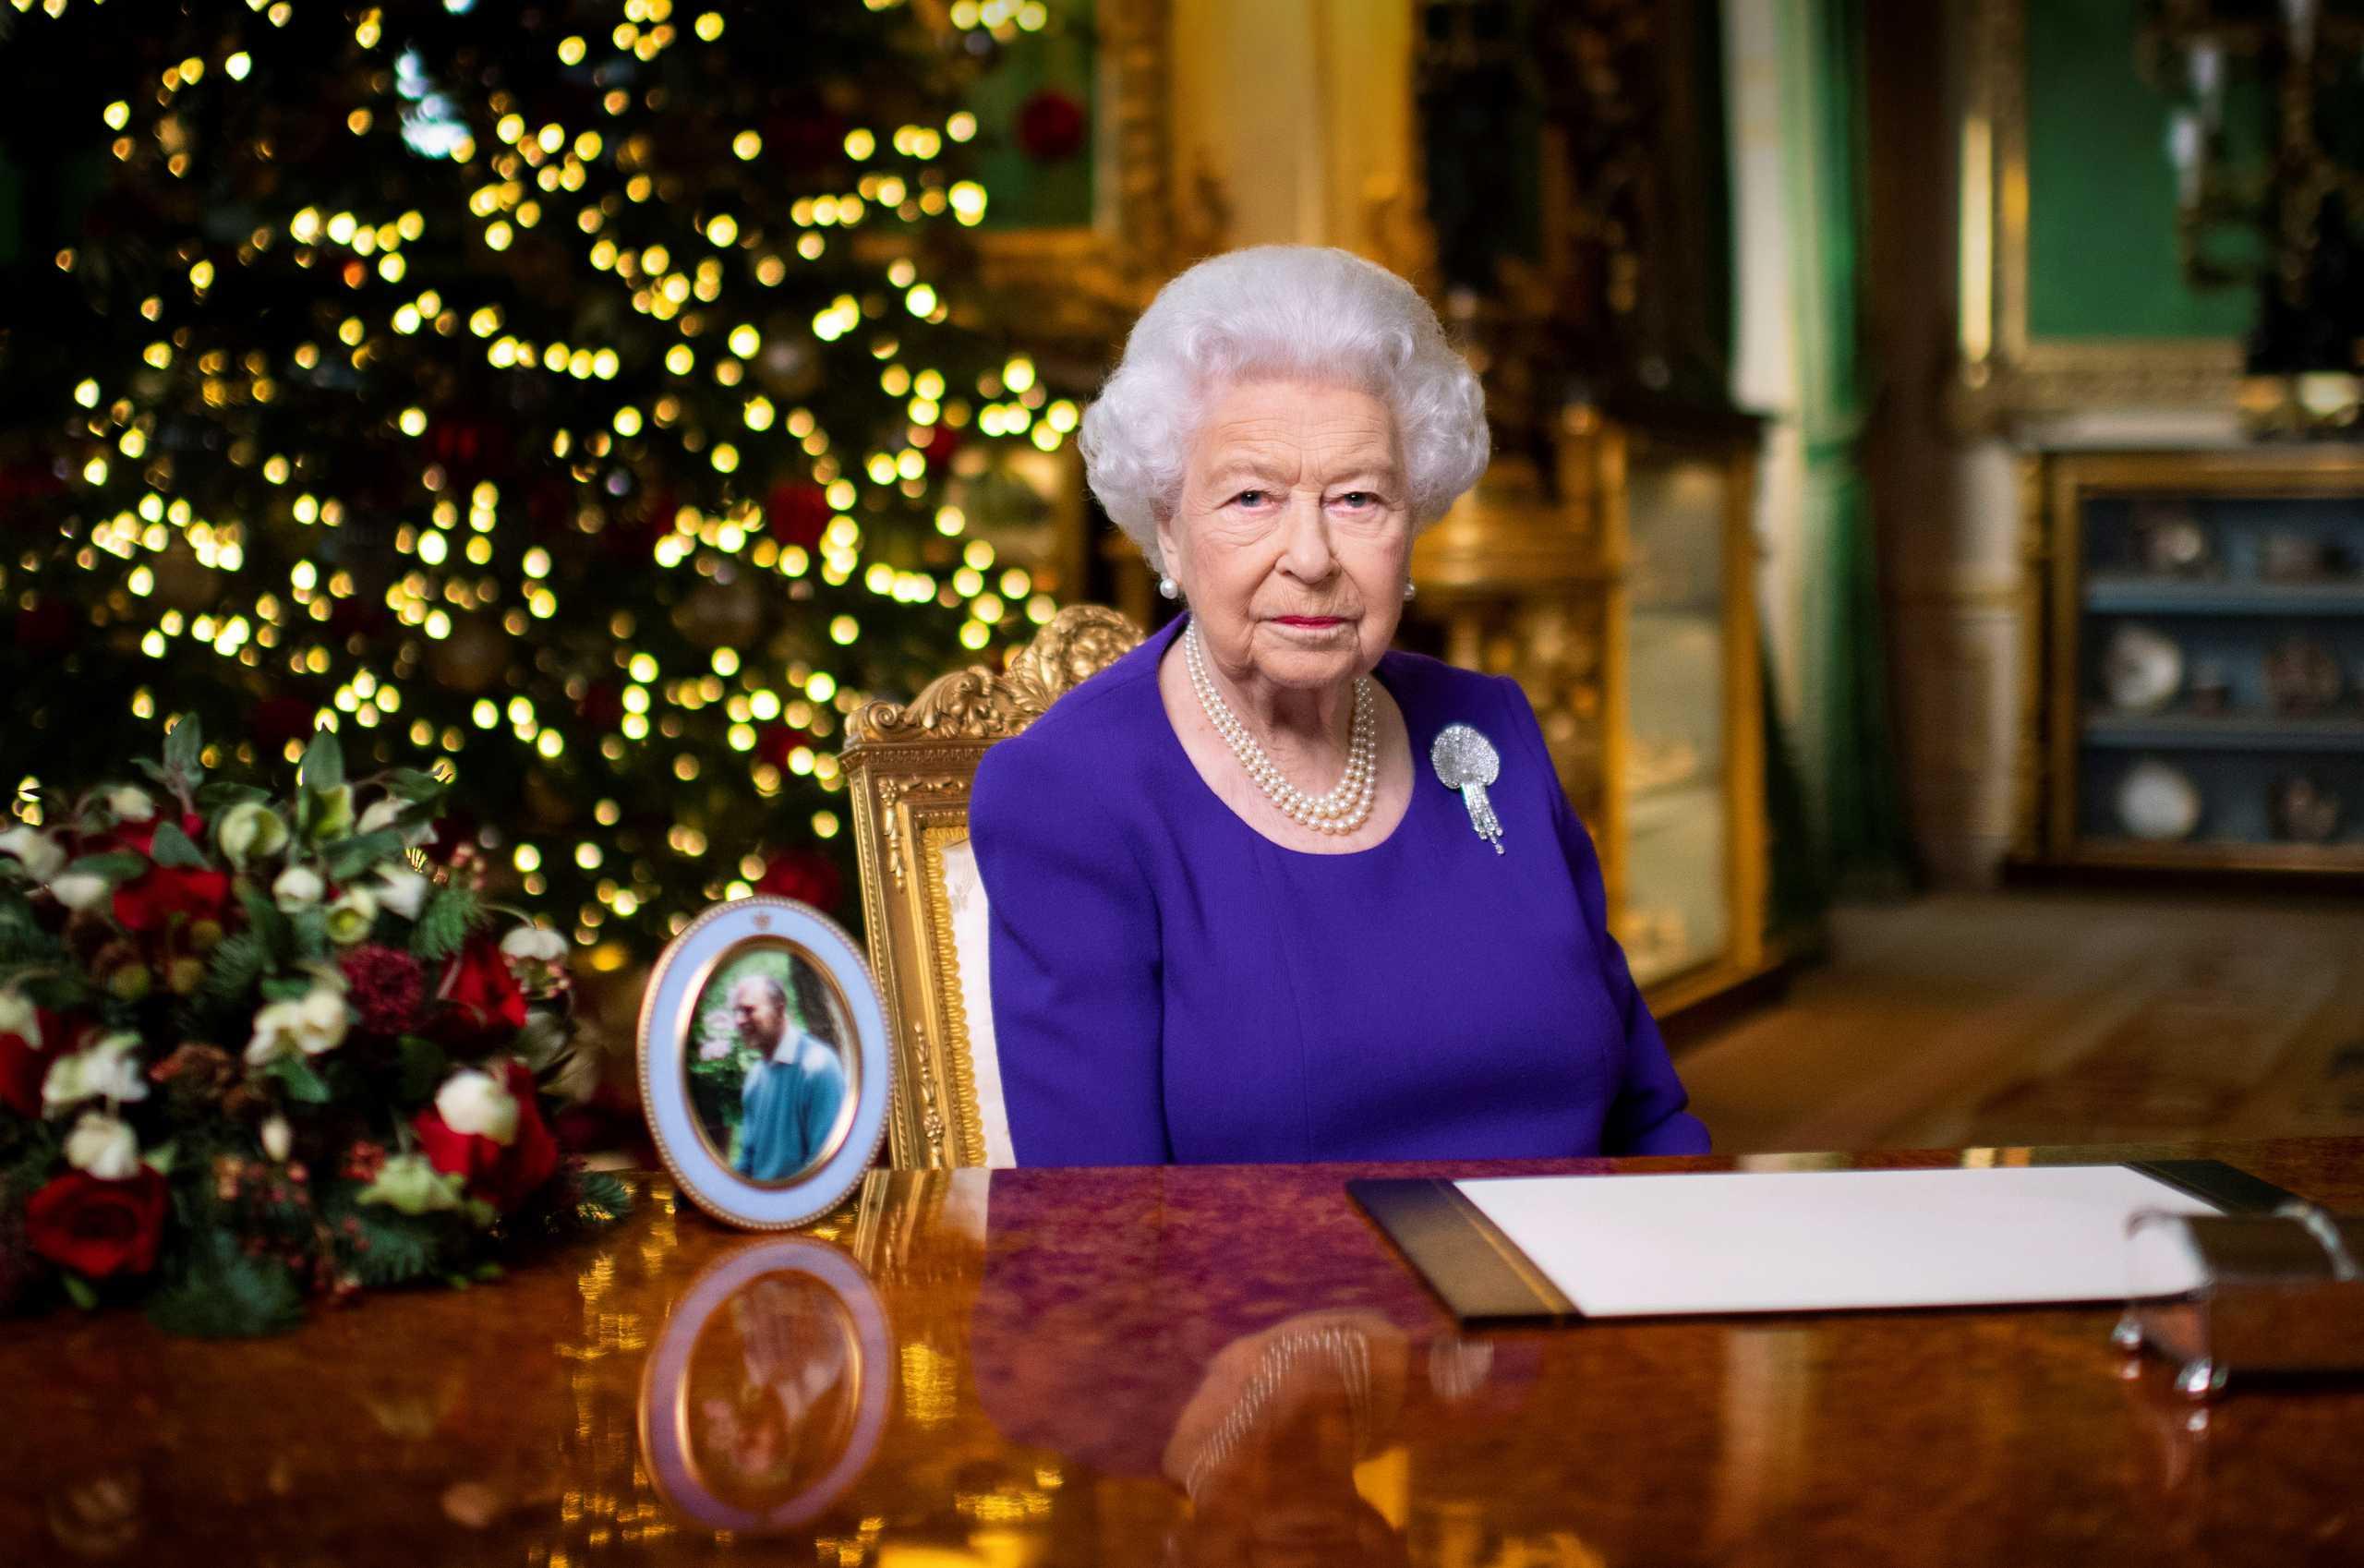 To χριστουγεννιάτικο μήνυμα της βασίλισσας Ελισάβετ: Το πιο ακριβό δώρο μία αγκαλιά (vid)